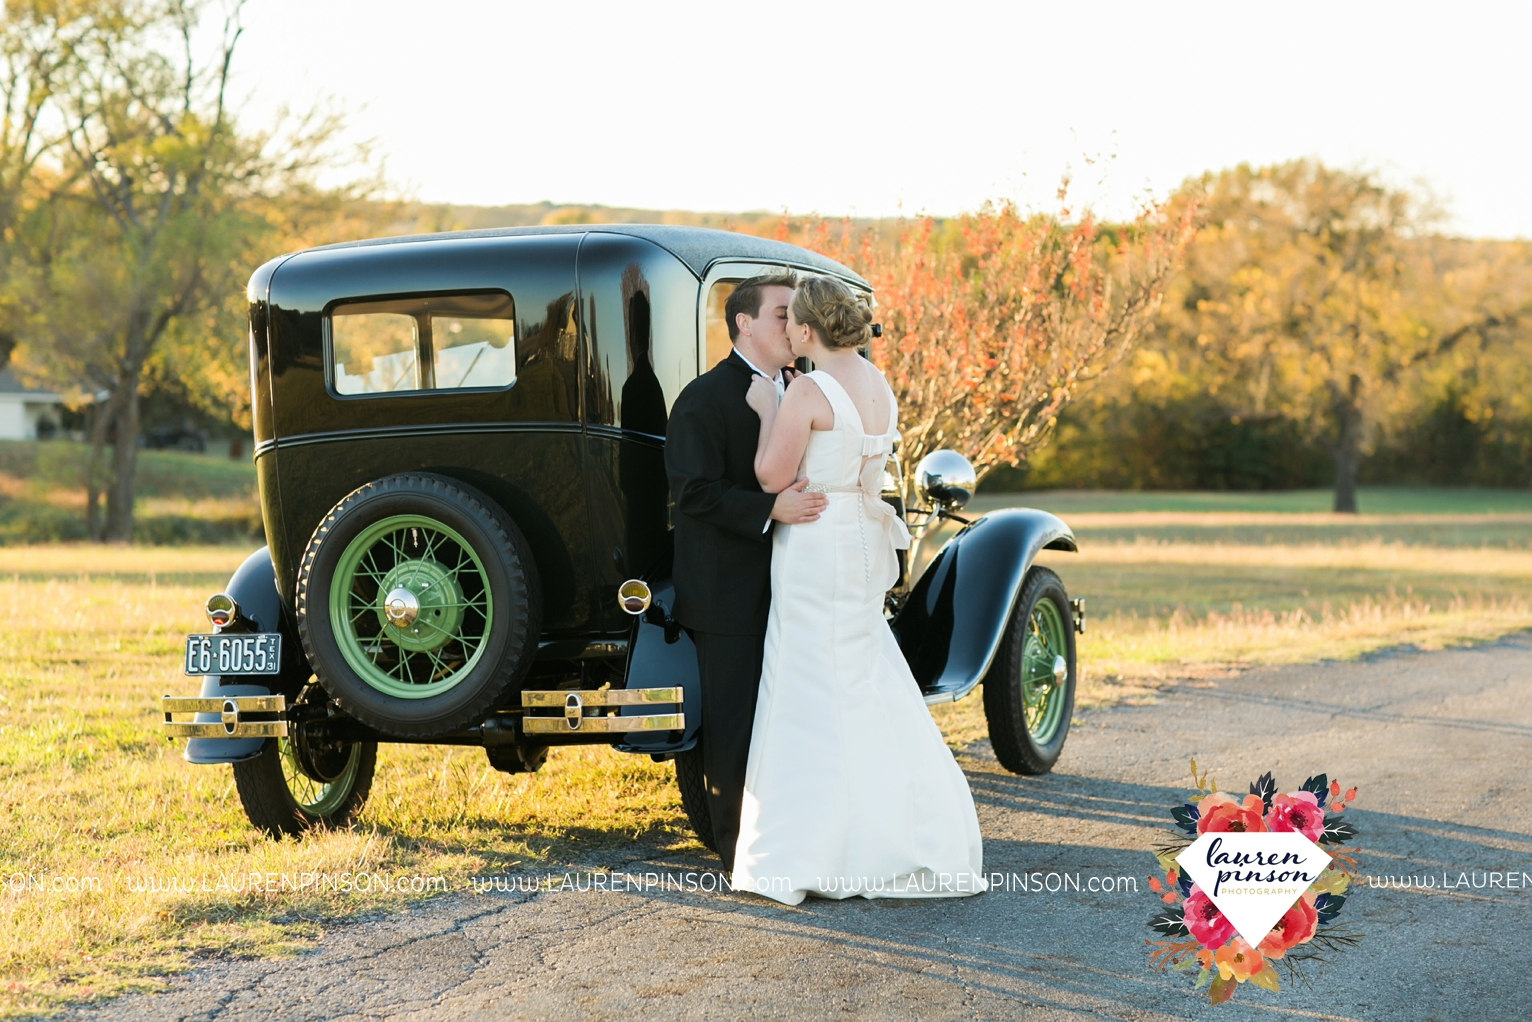 bells-texas-wedding-photography-at-willowood-ranch-chapel-north-texas-wichita-falls-wedding-photographer_1853.jpg